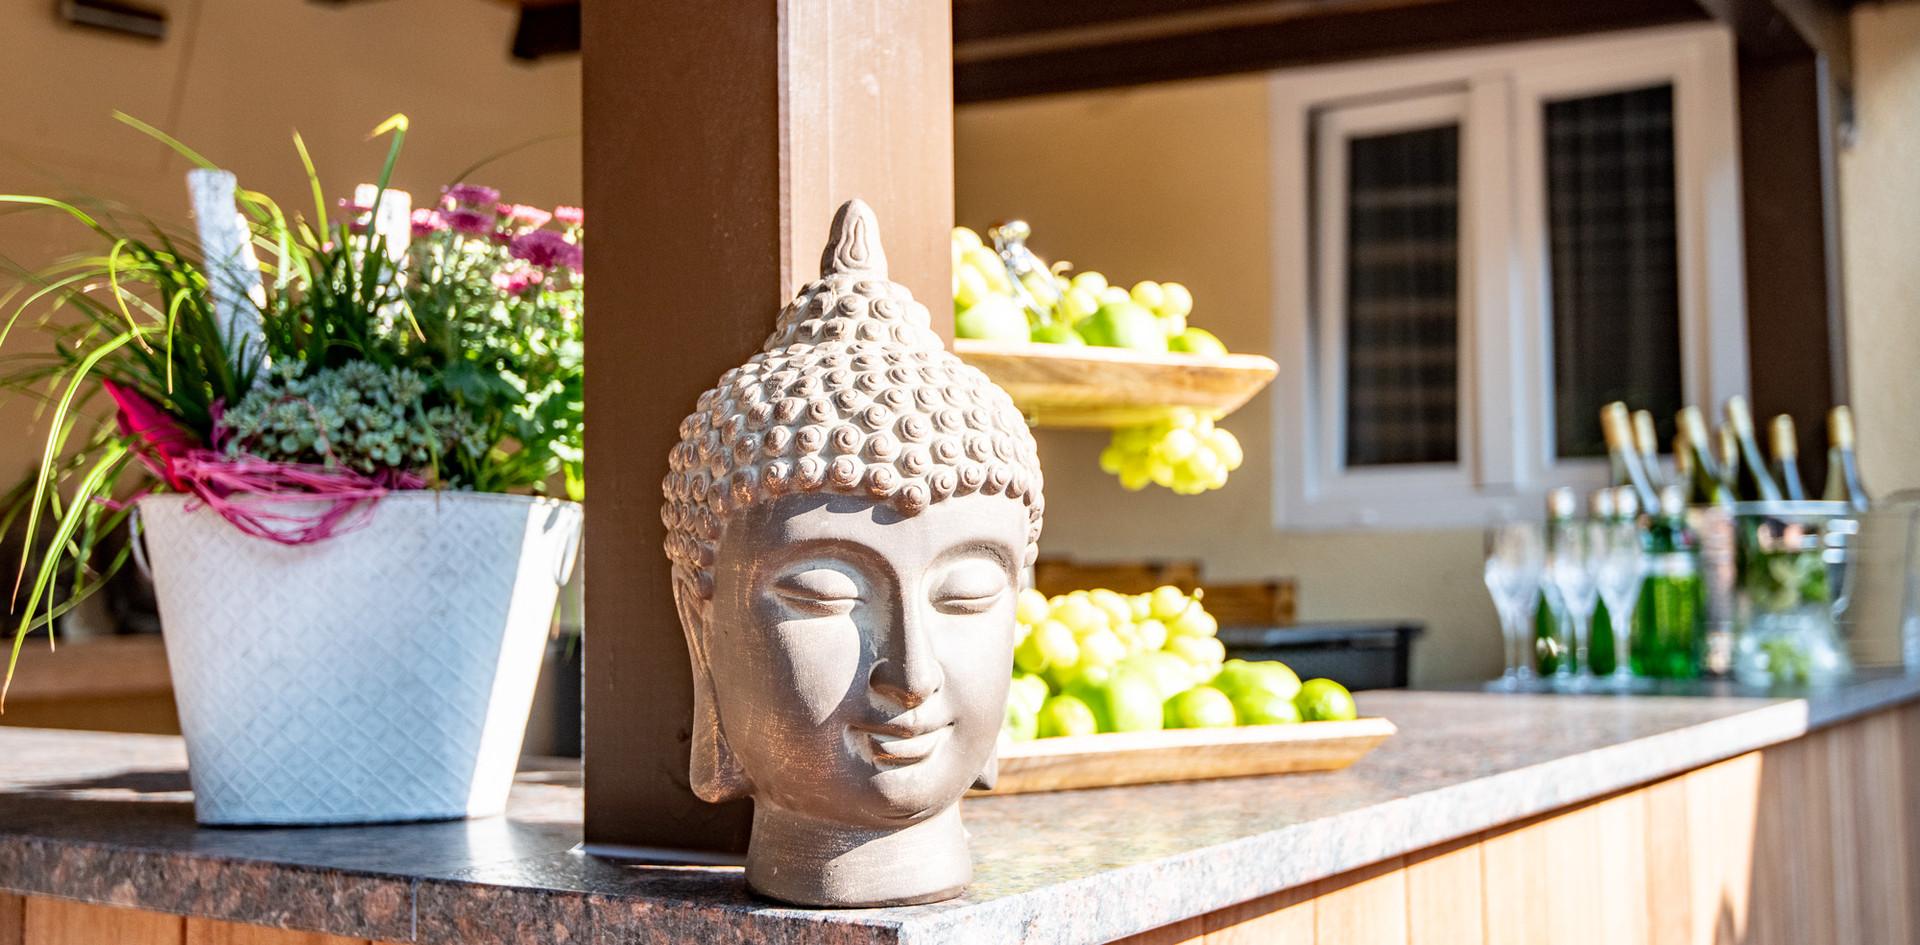 Deko Buddha-kopf Hotel Wegner - the culinary art hotel